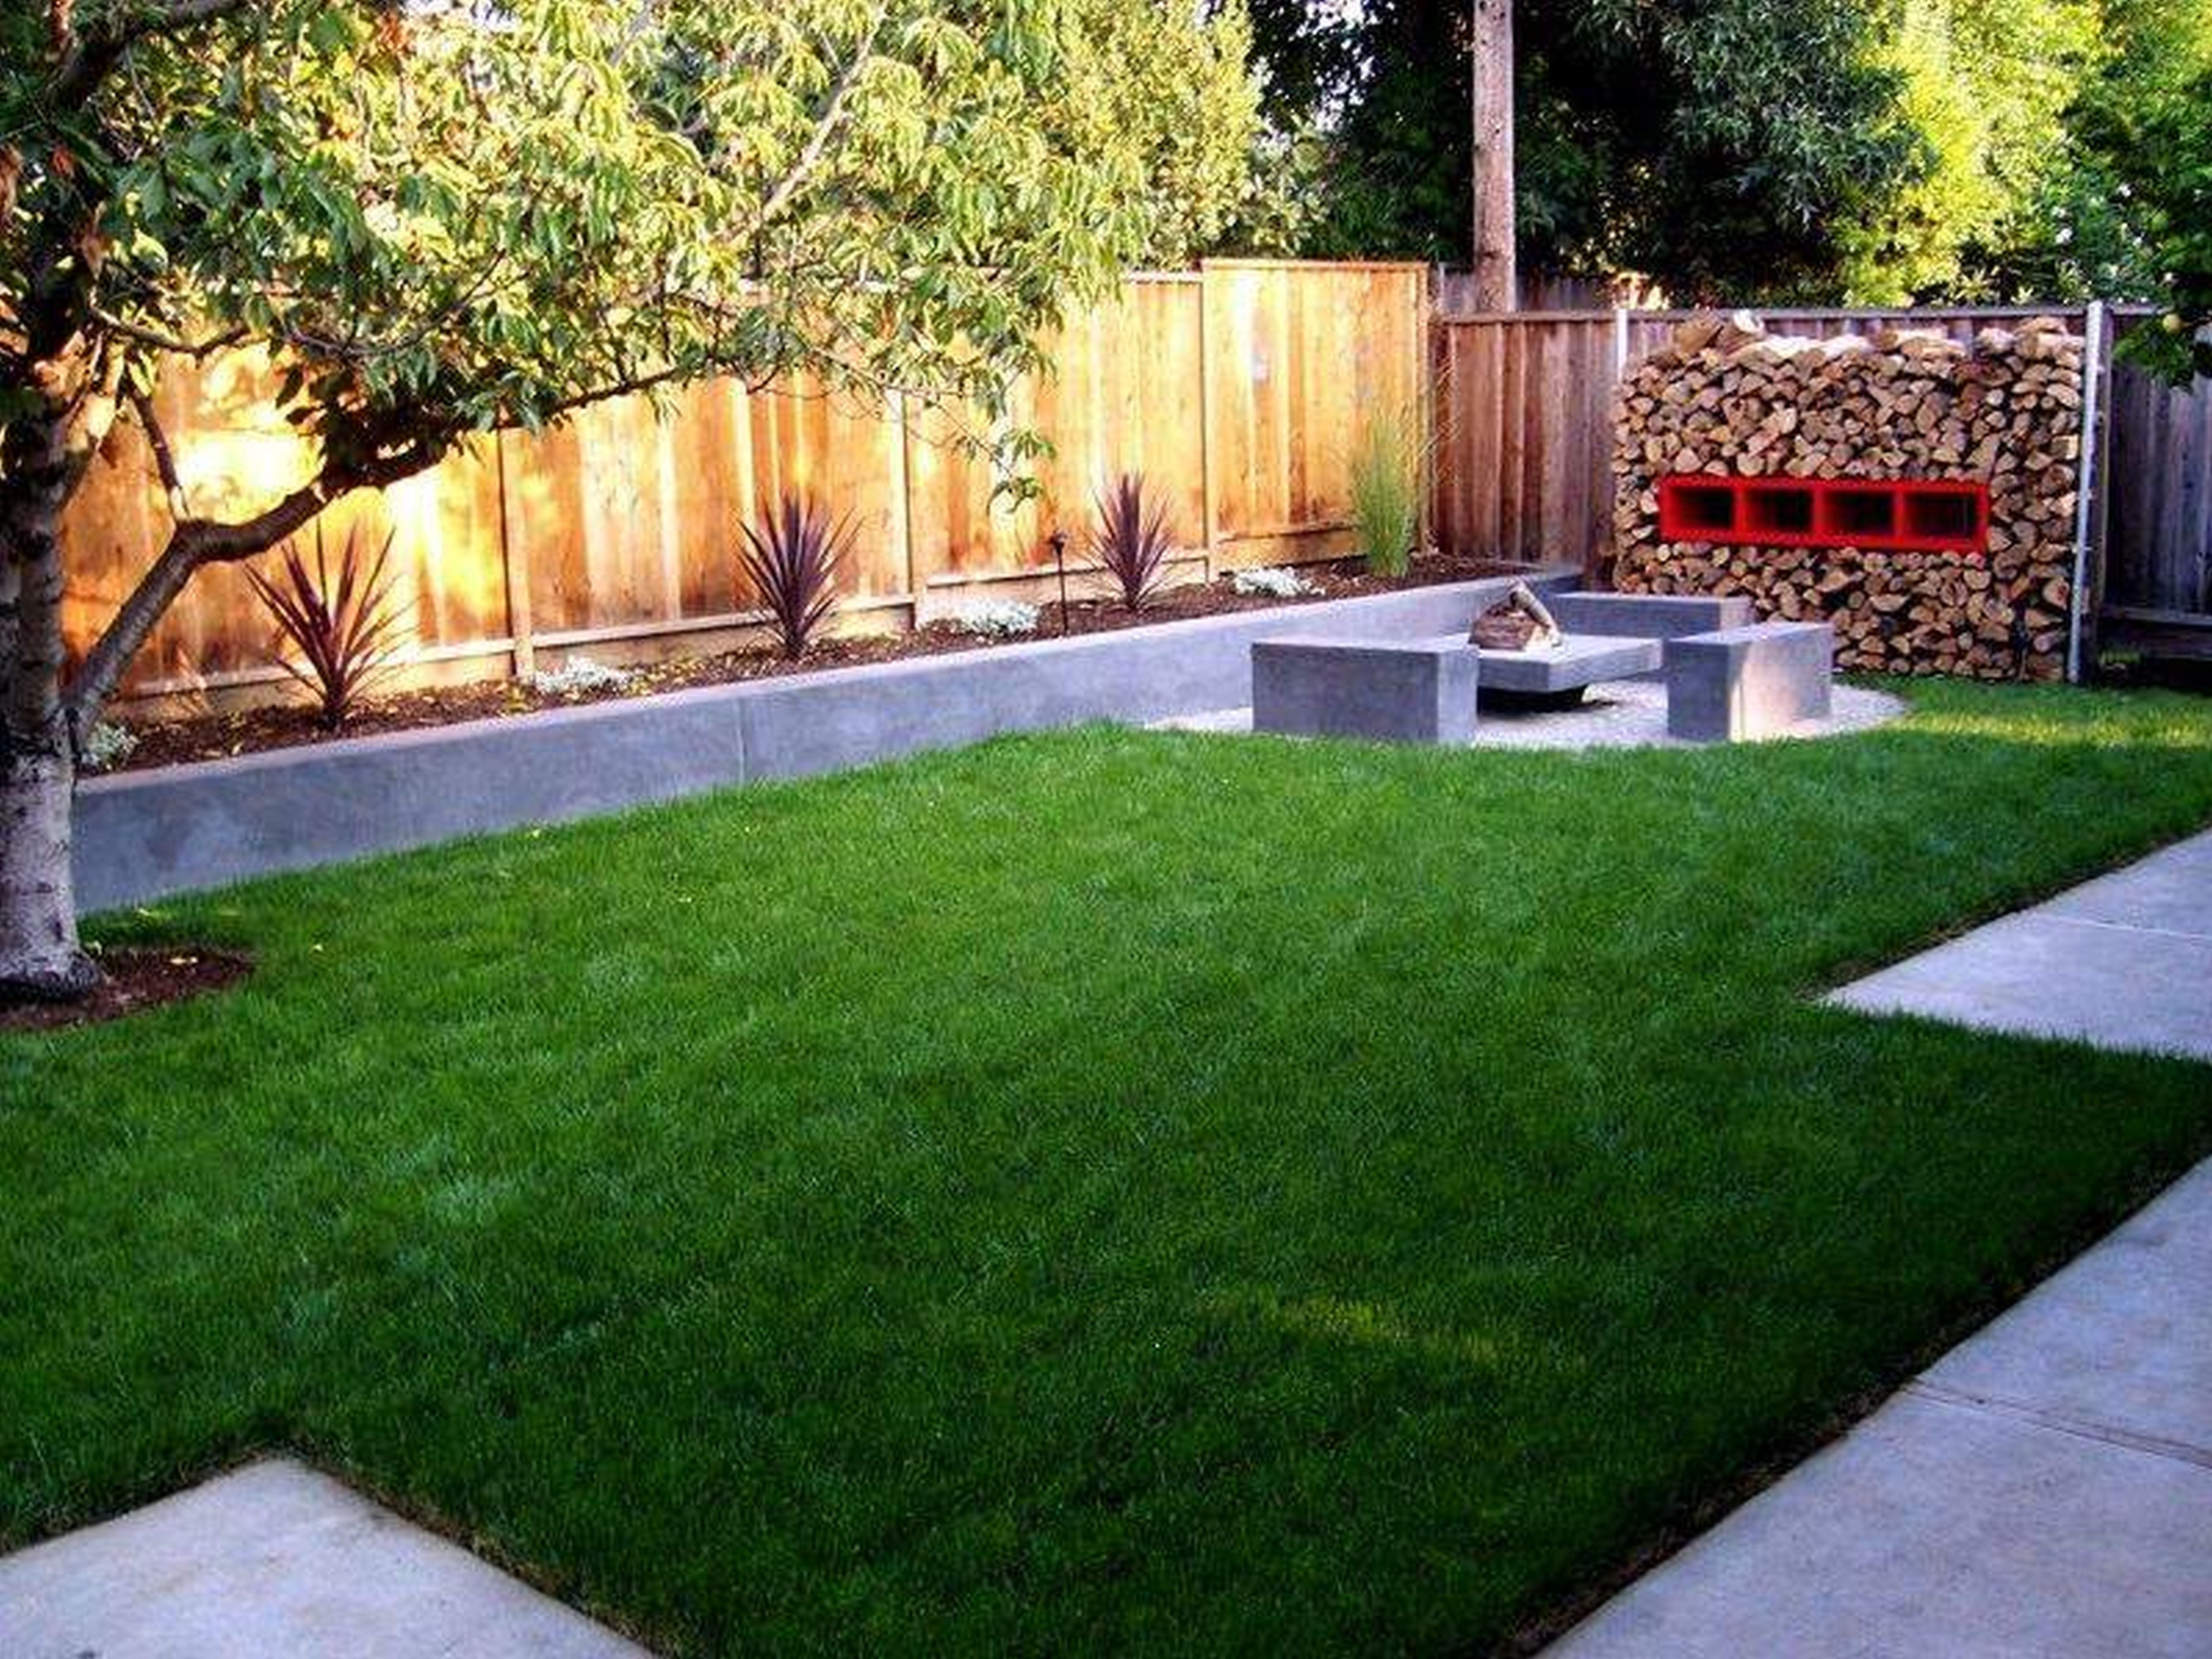 10 Fantastic Small Backyard Ideas On A Budget landscaping ideas for small backyards backyard on a budget beautiful 2020